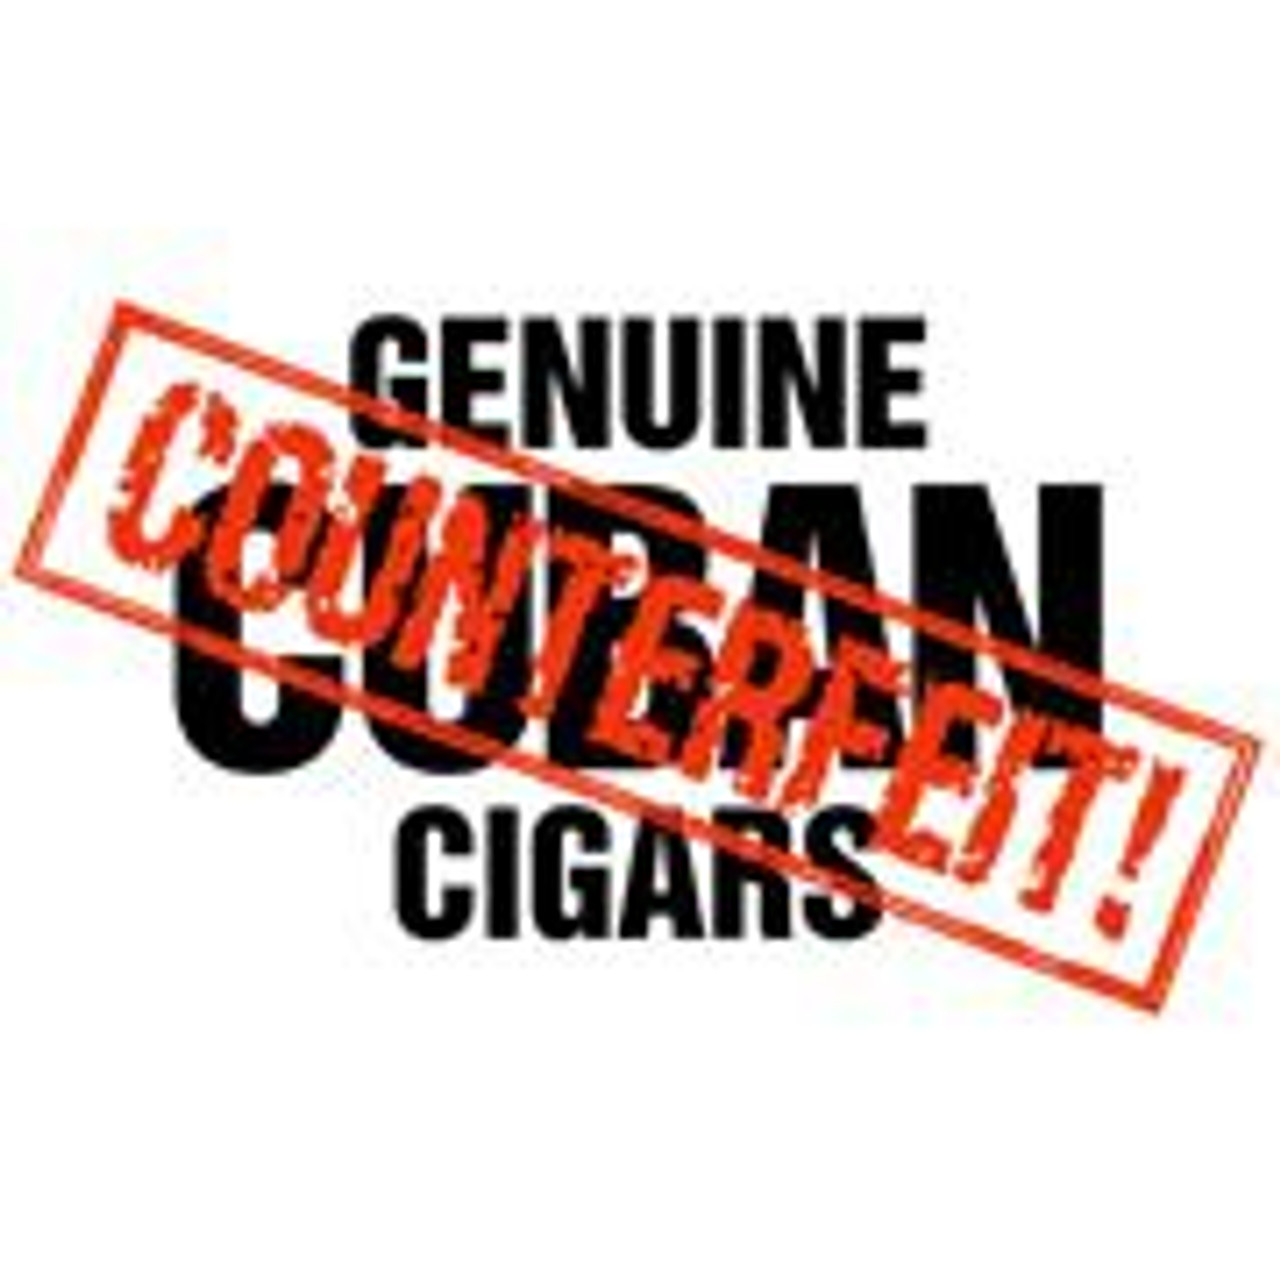 Genuine Counterfeit Cuban Robusto Cigars - 5.0 x 50 (Cedar Chest of 25)